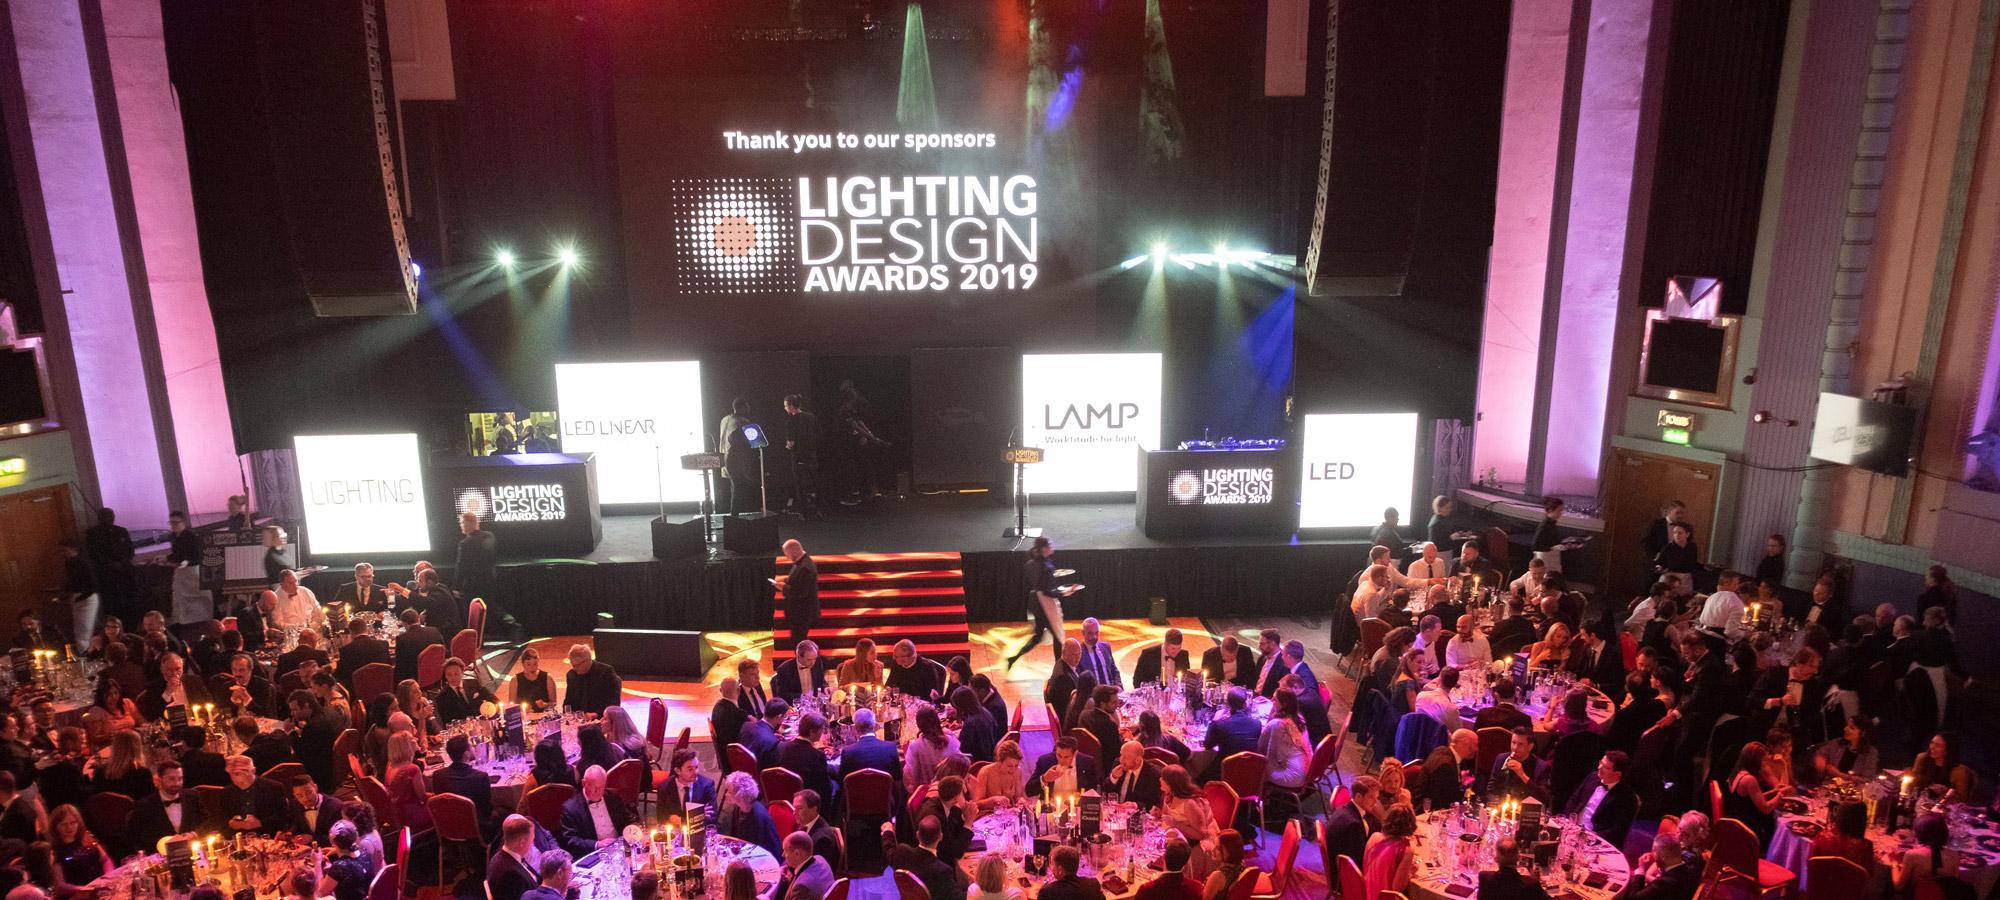 Lighting Design Awards 2019